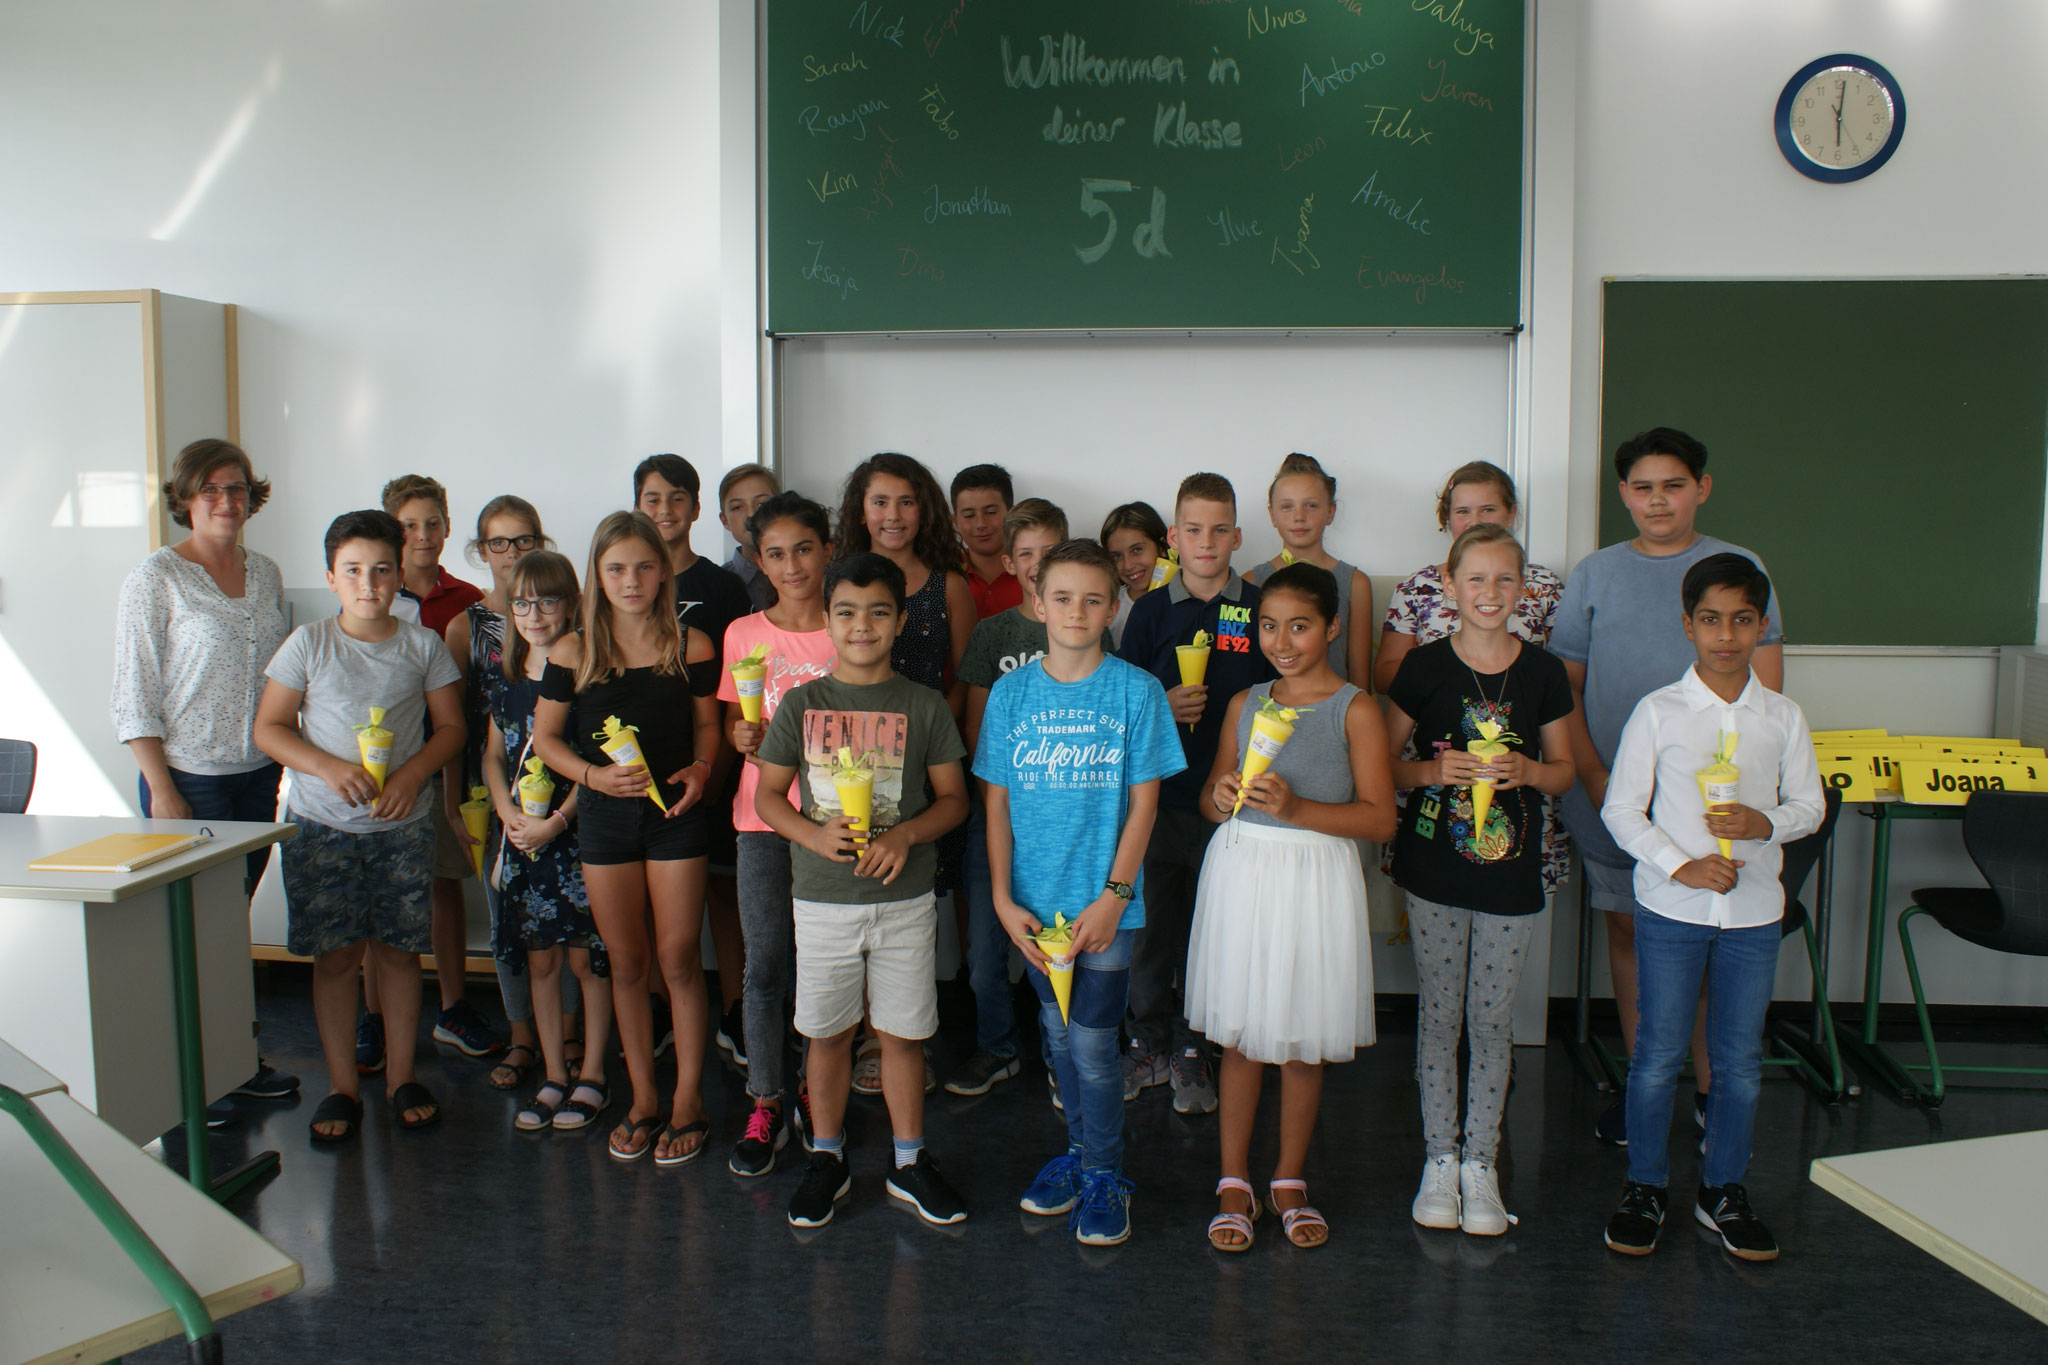 Klasse 5d, Klassenlehrerin Miriam Ott